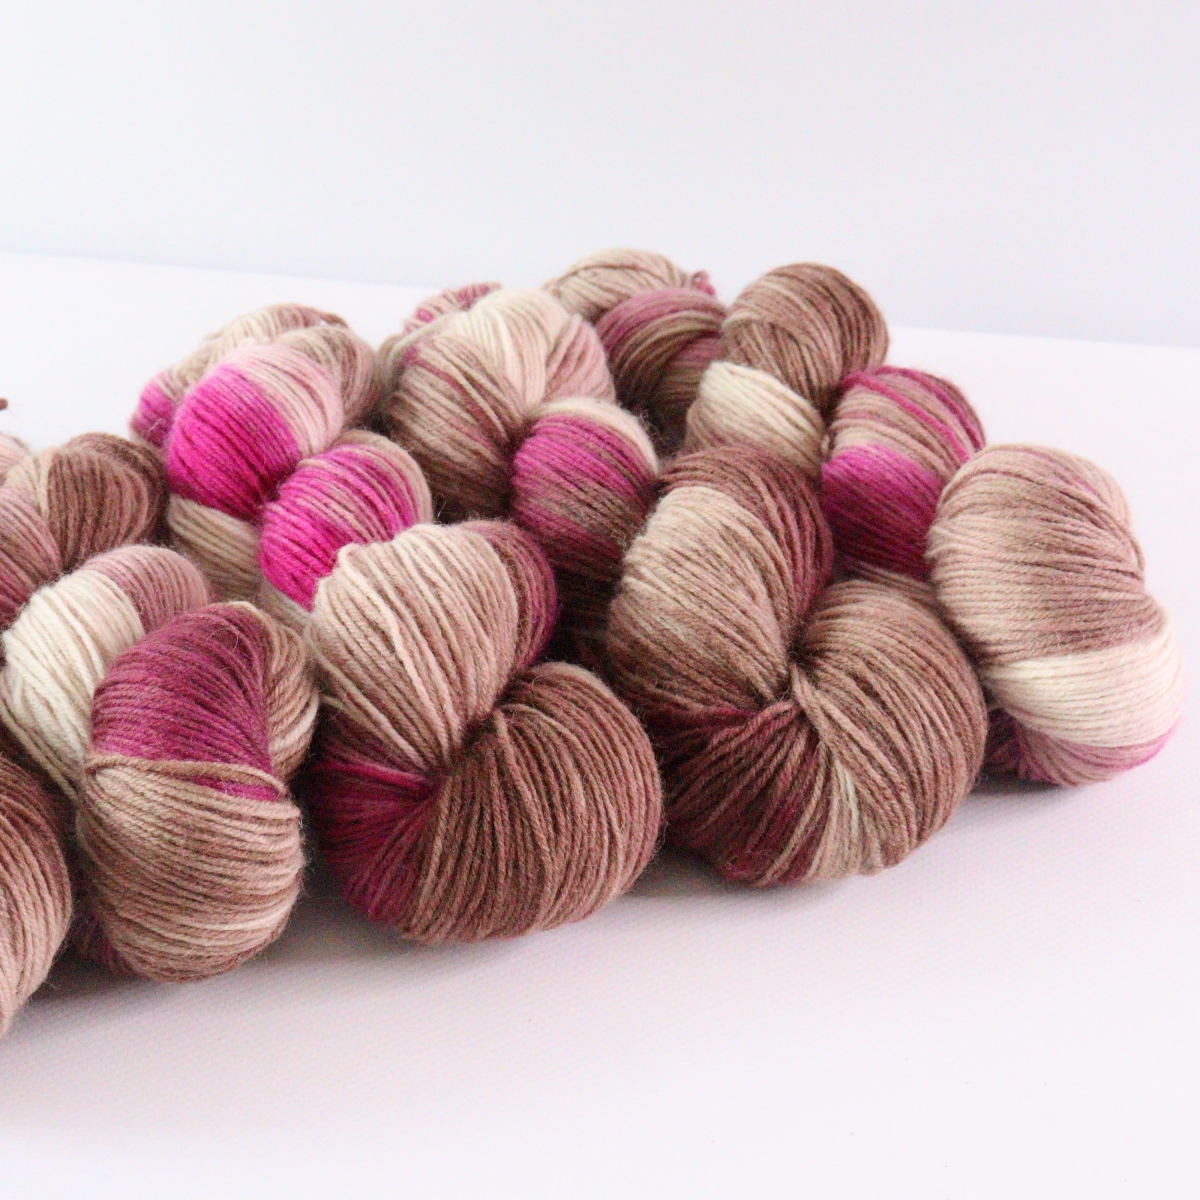 woodico.pro hand dyed yarn 073 4 1200x1200 - Hand dyed yarn / 073